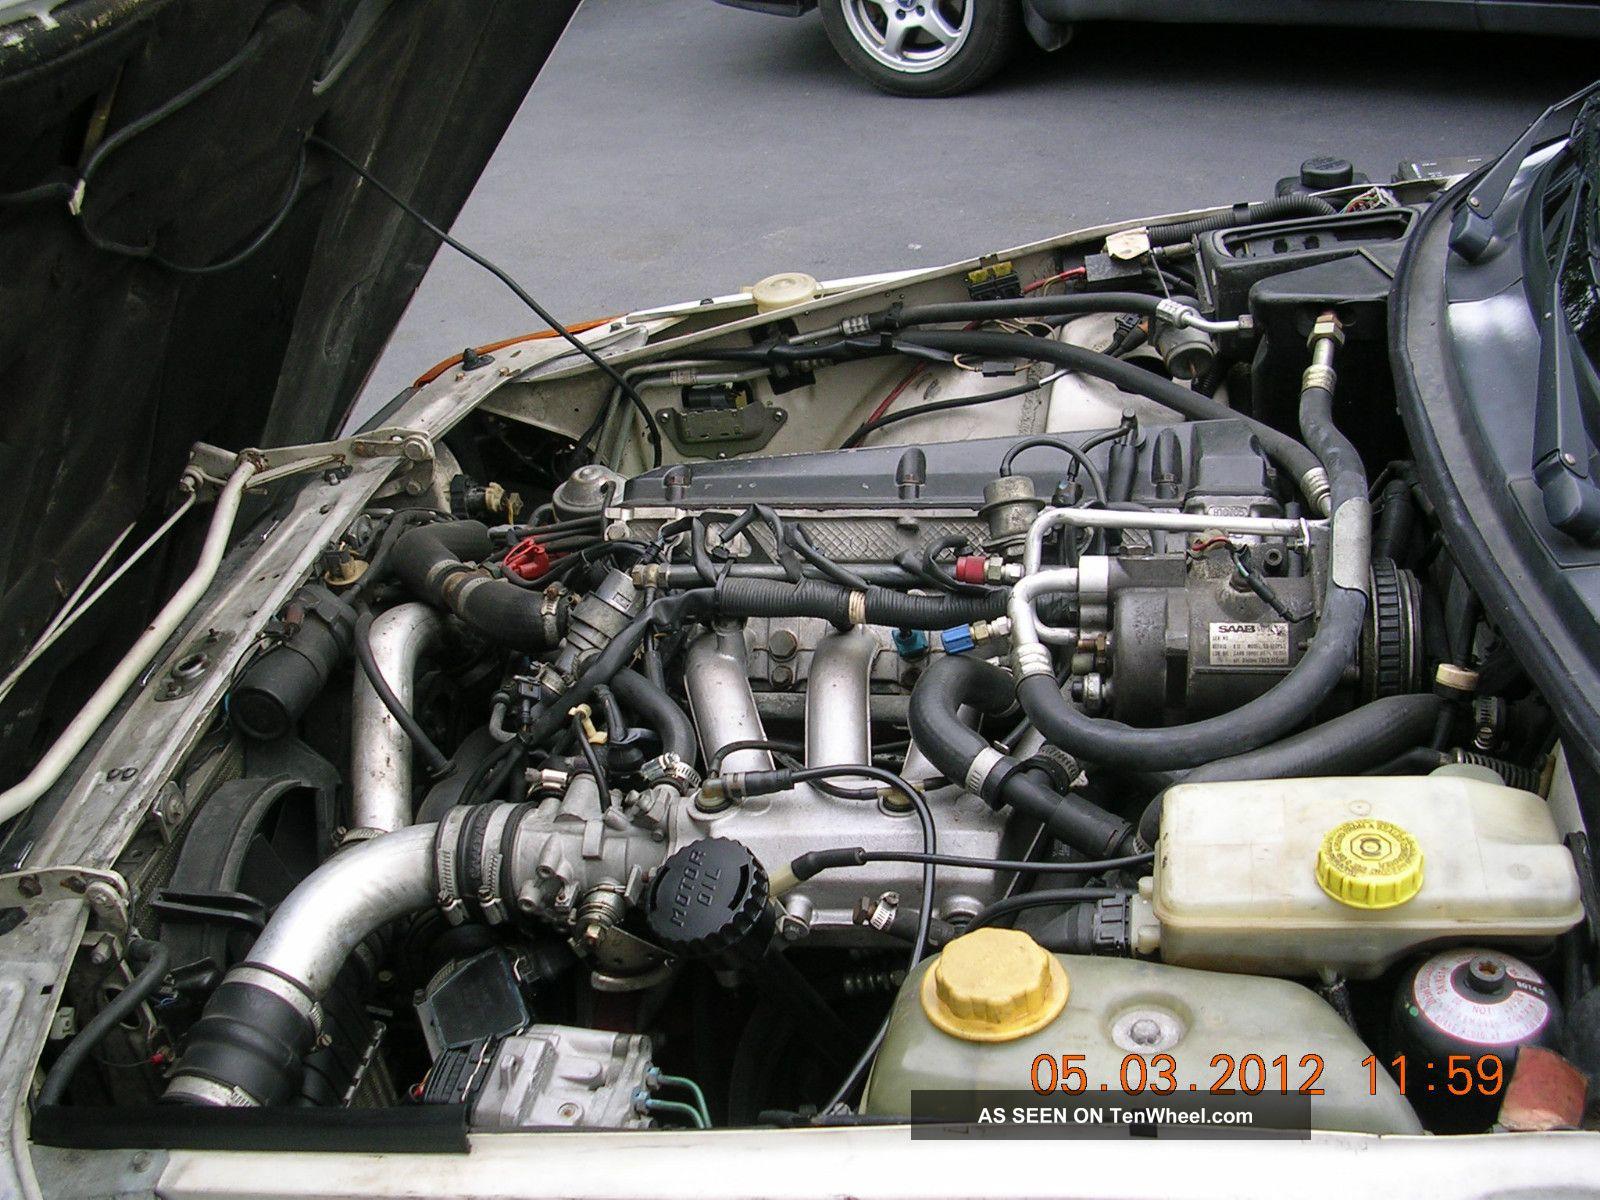 1994 Saab 900 Engine Diagram Or Manual